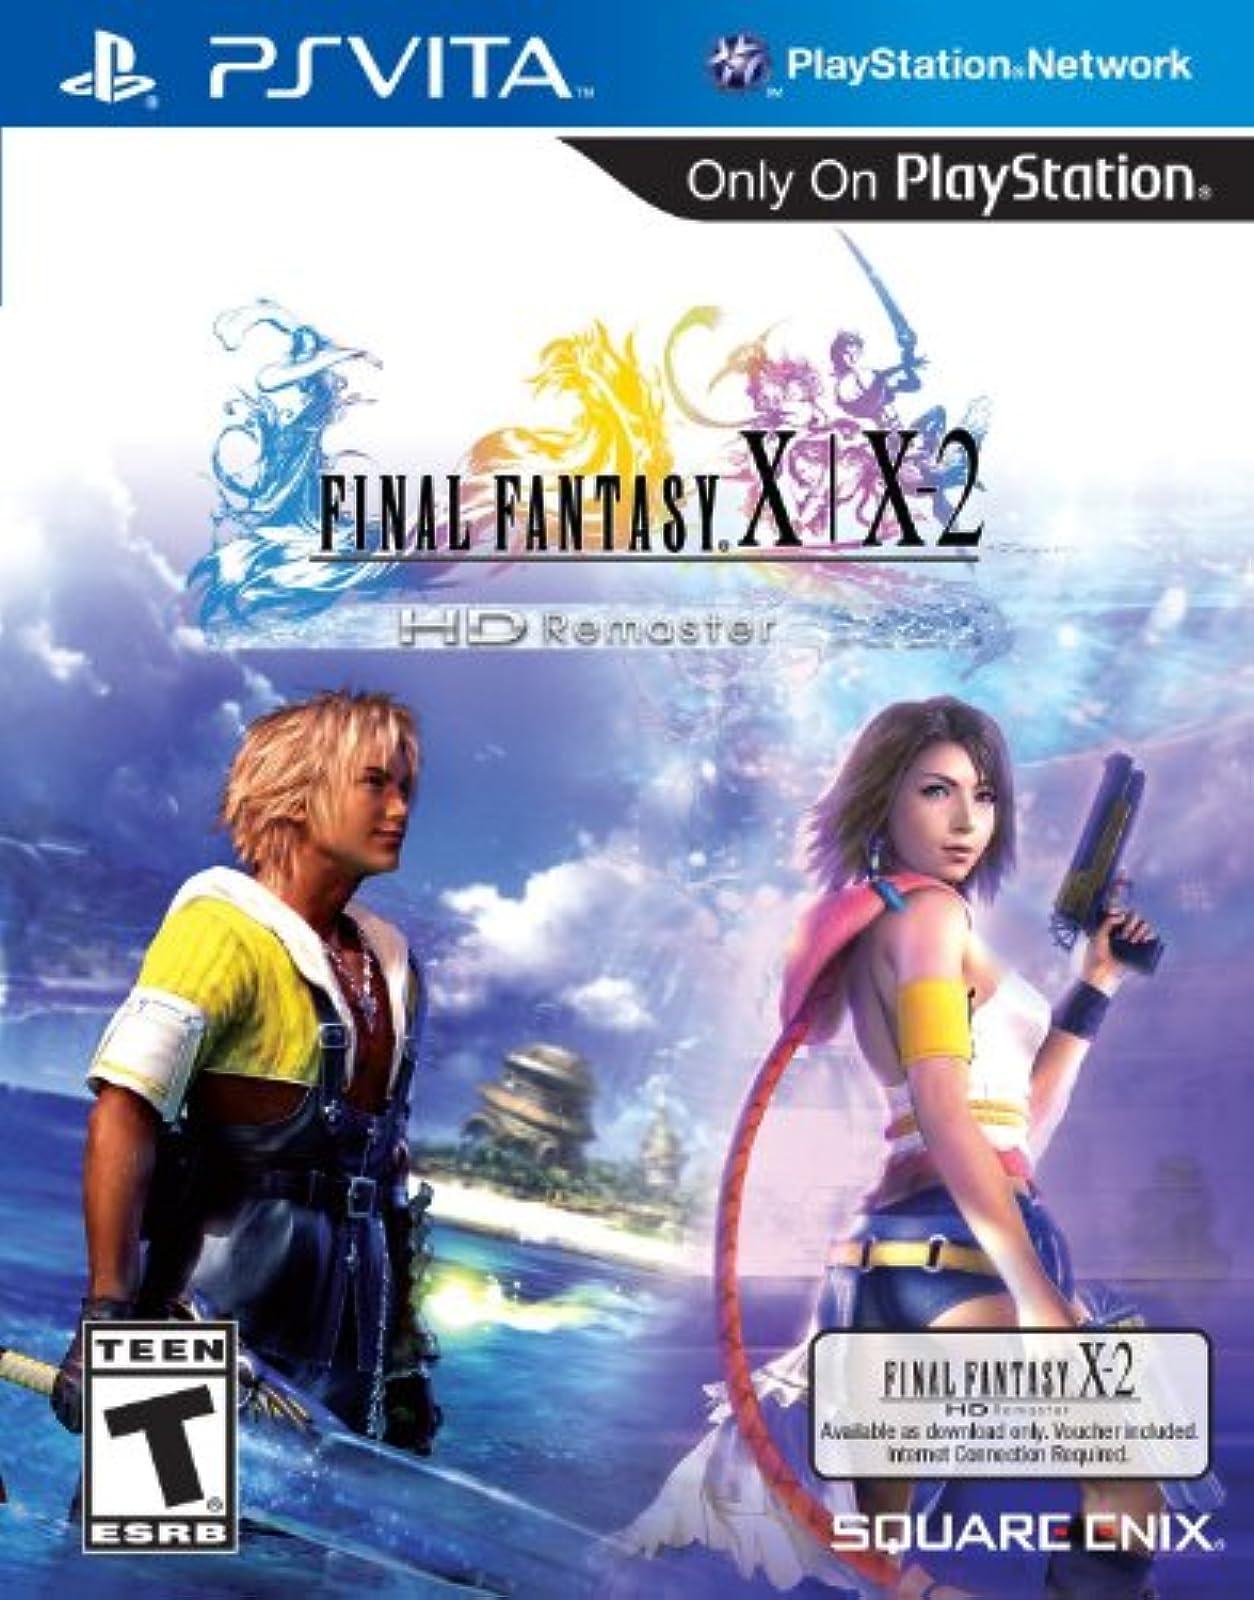 Final Fantasy X RPG For Ps Vita